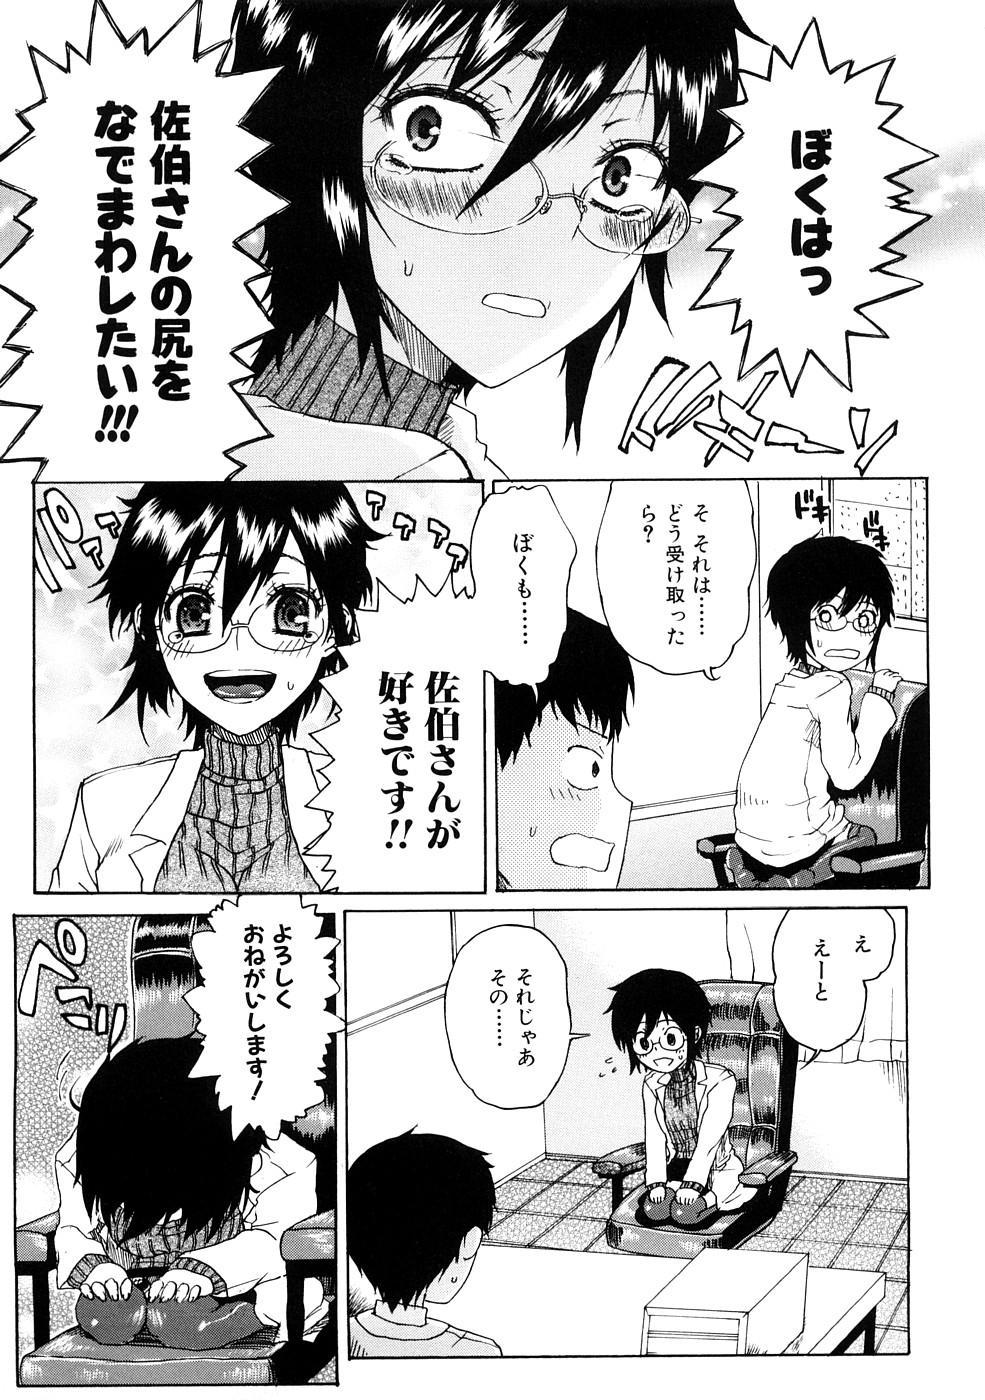 Ecchi de Jibunkatte de Kawaii Ko 56